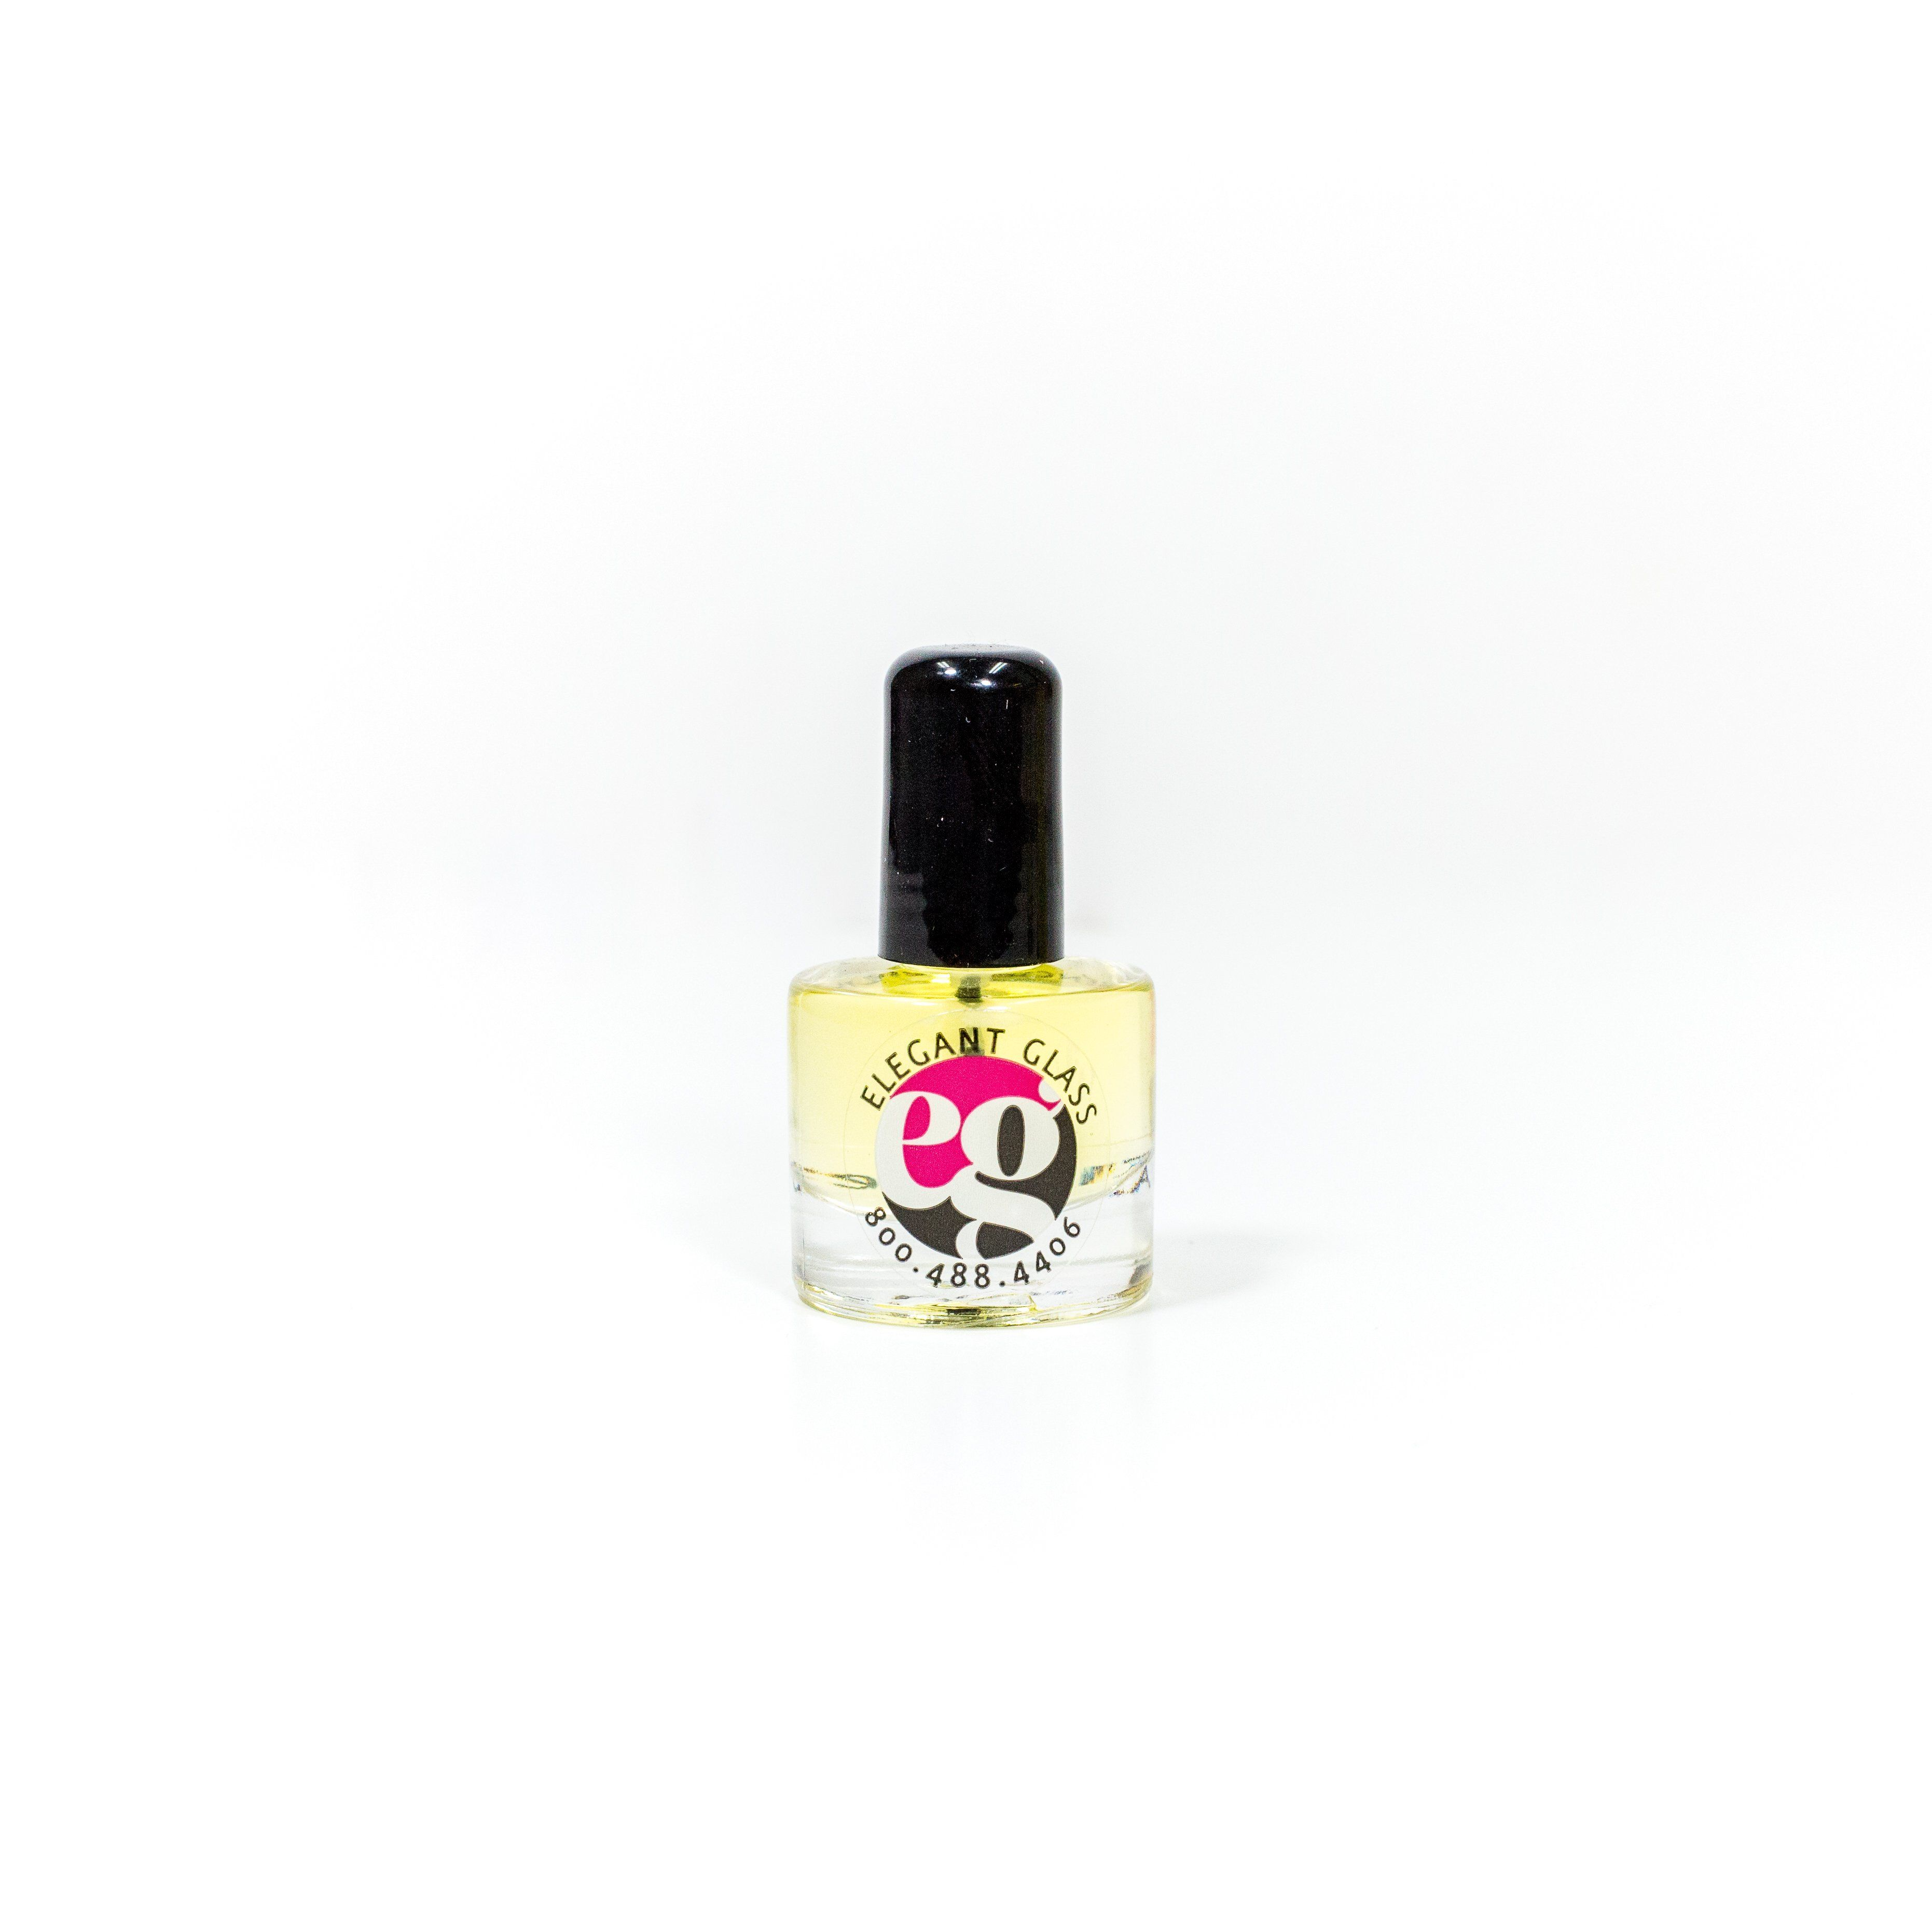 EGN Cuticle Oil Cuticle oil, Natural oils, Perfume bottles